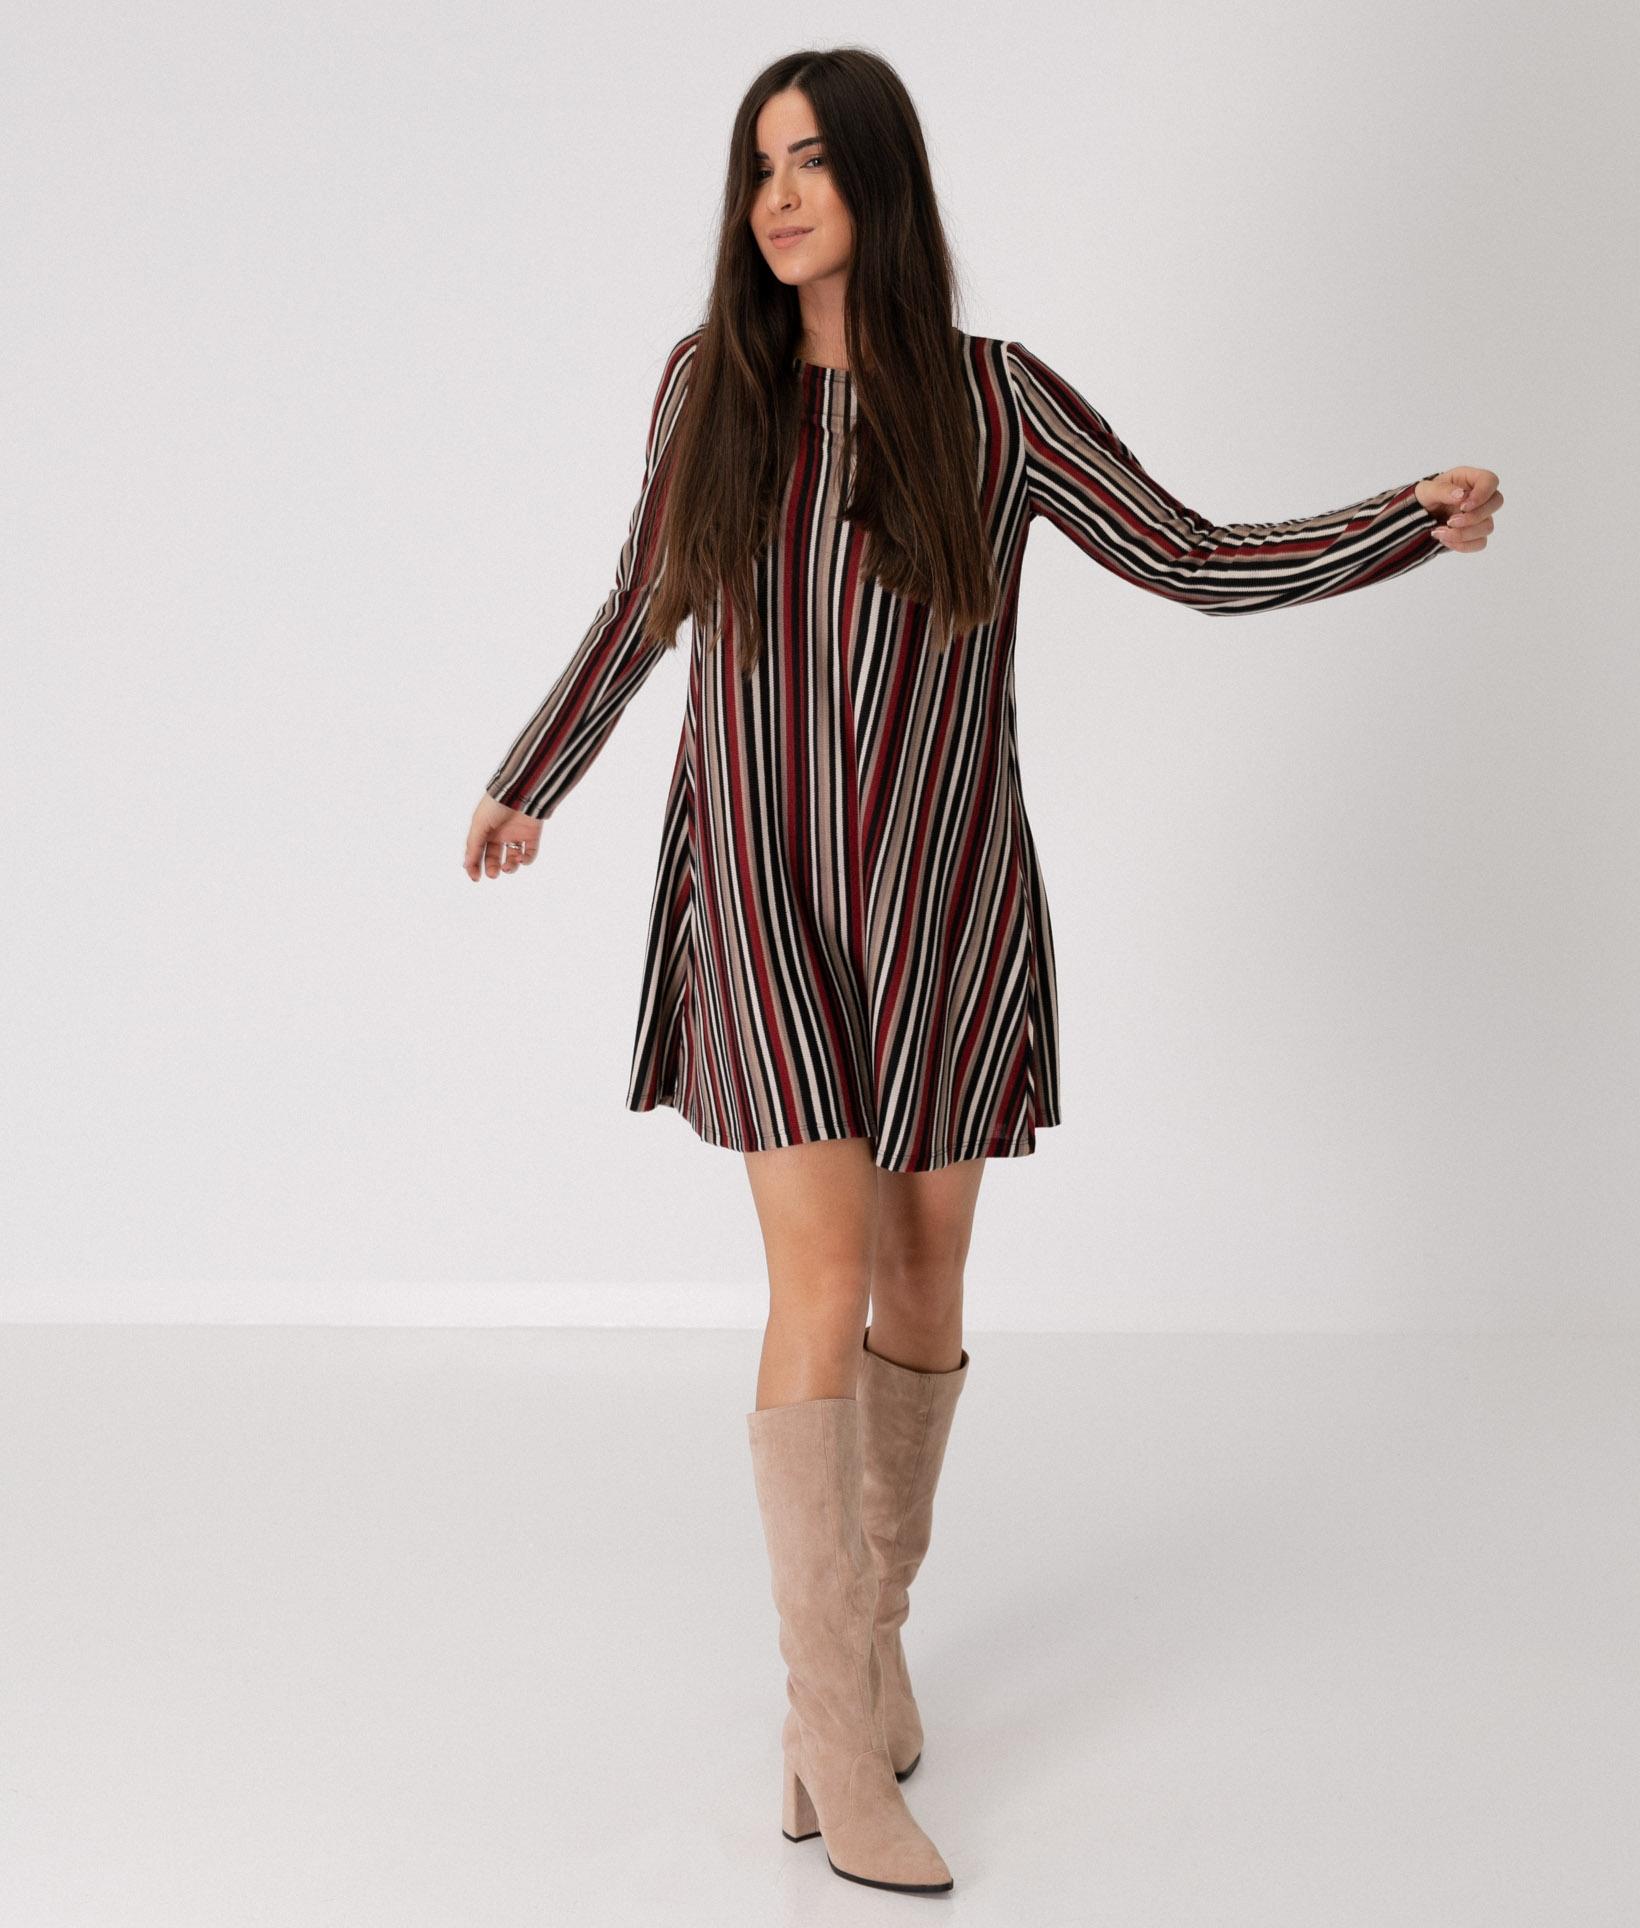 MIRIADE DRESS - MAROON